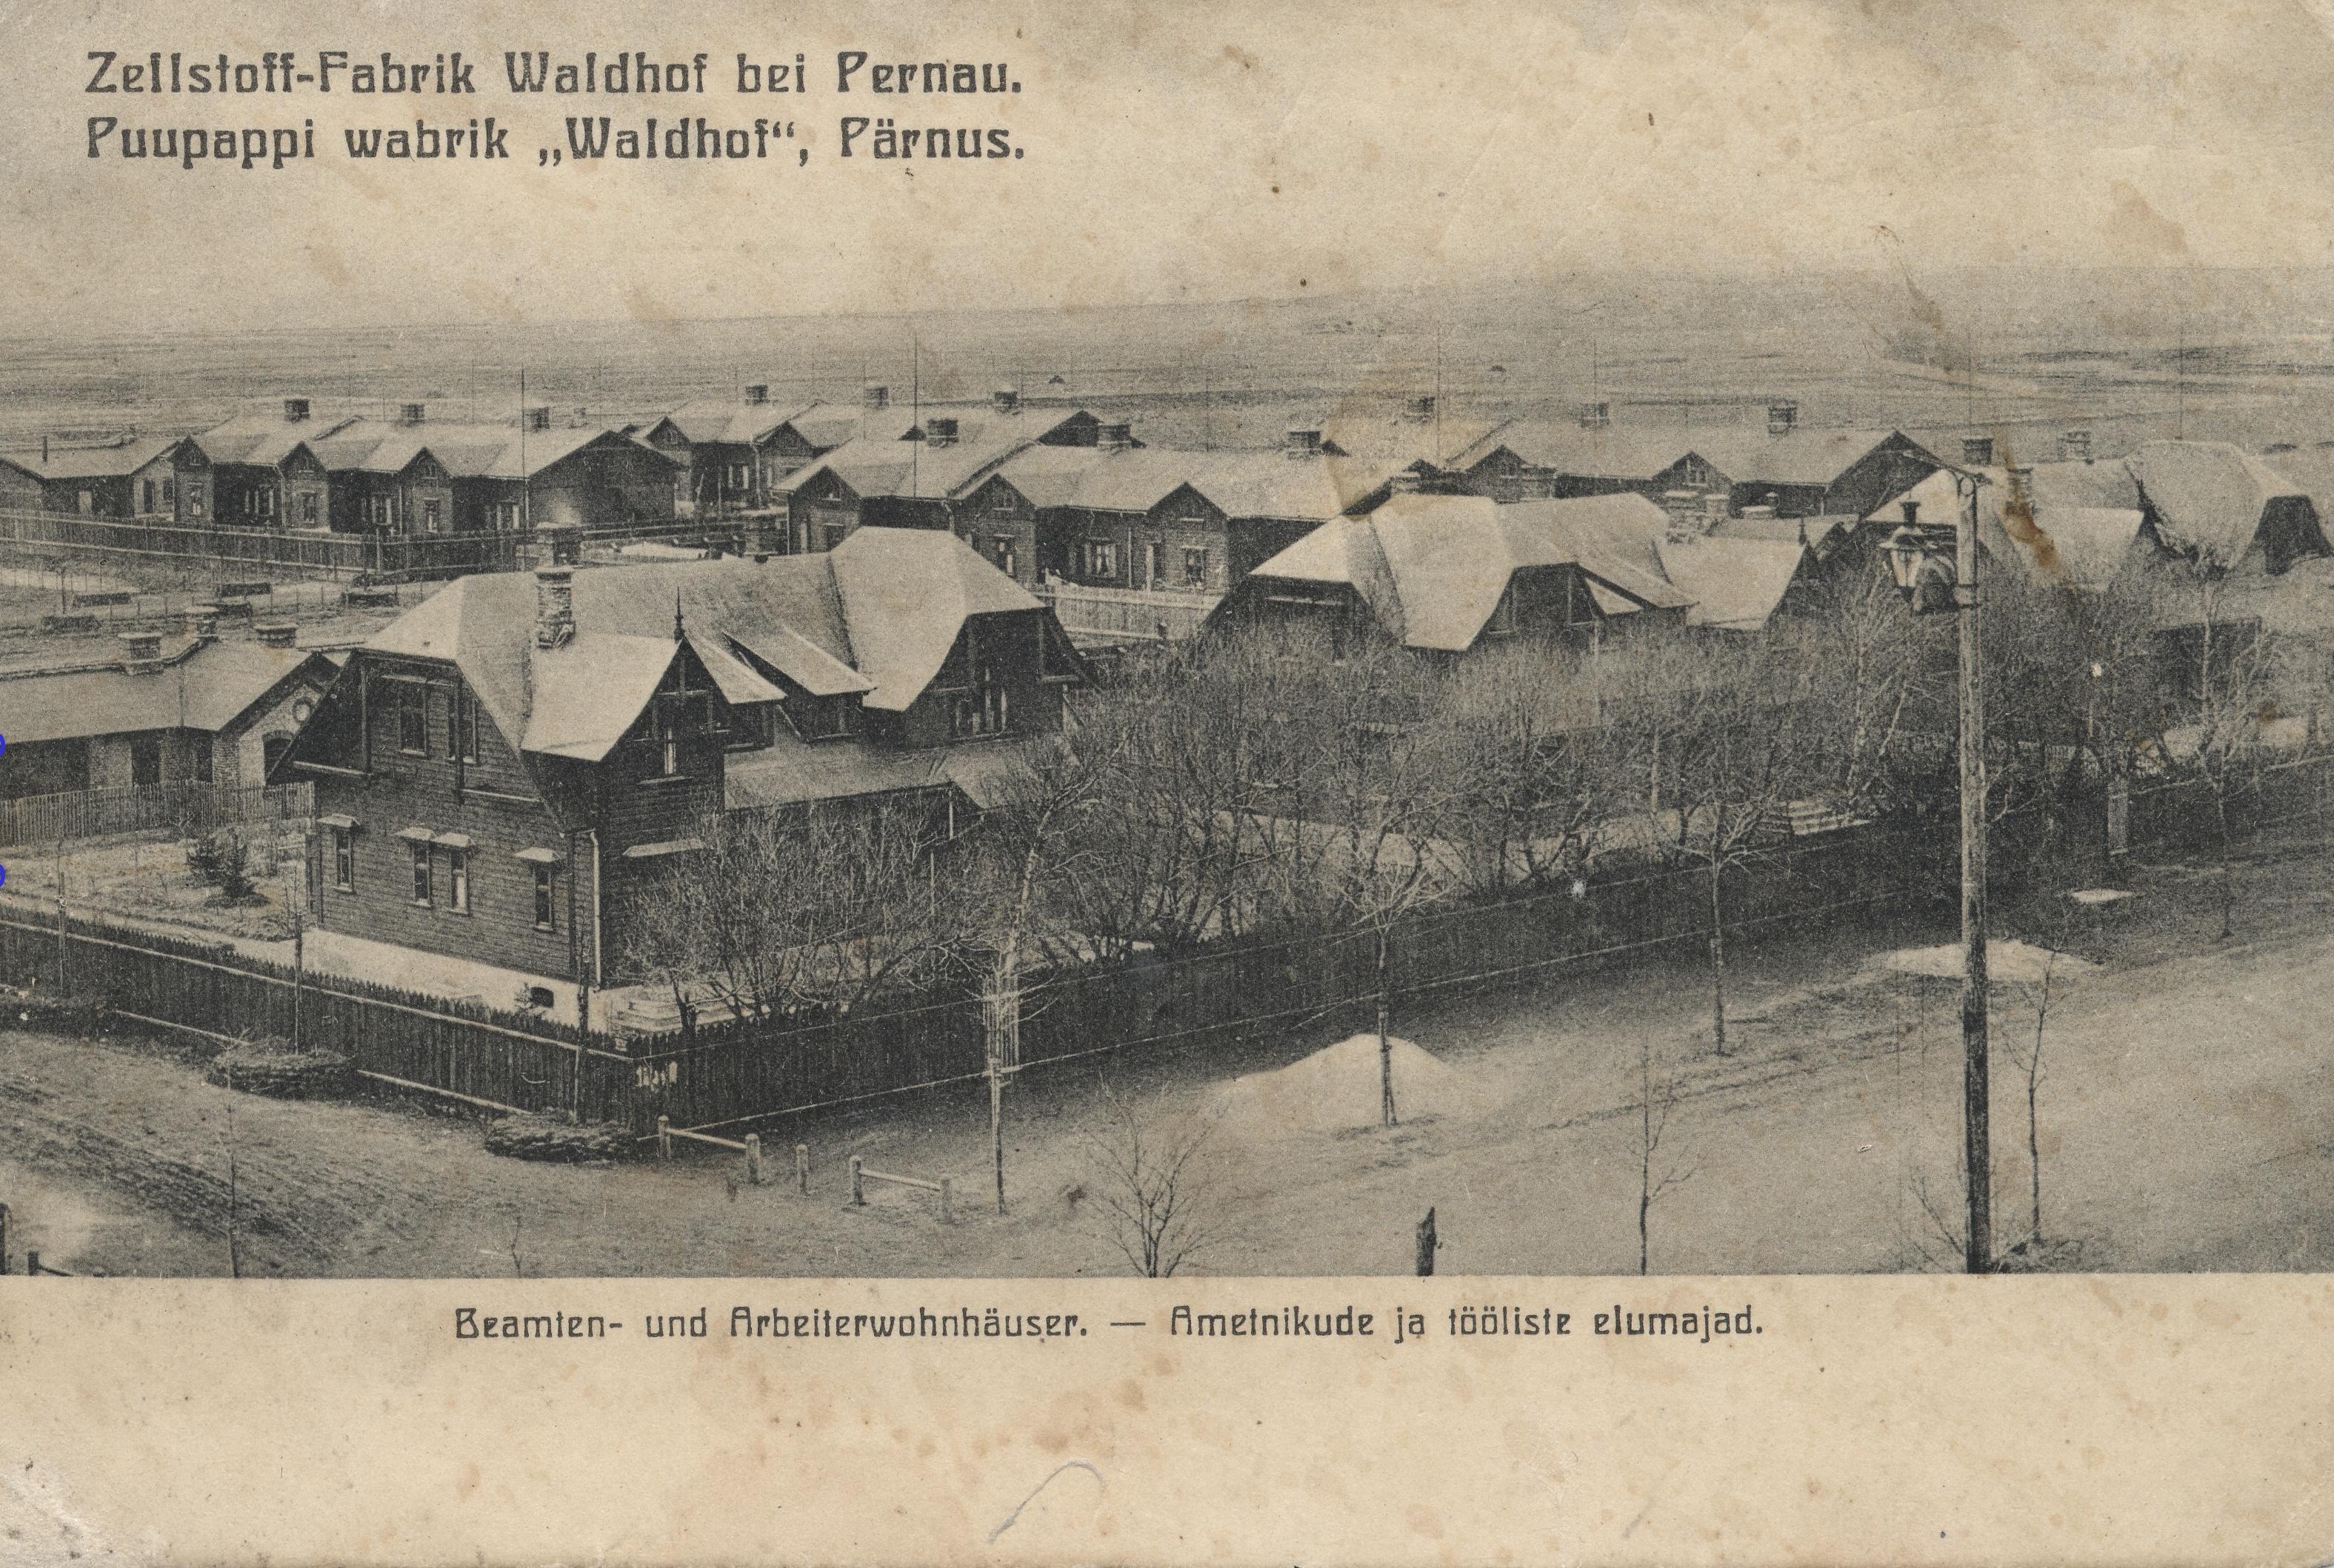 Целлюлозная фабрика. Дома служащих и рабочих фабрики